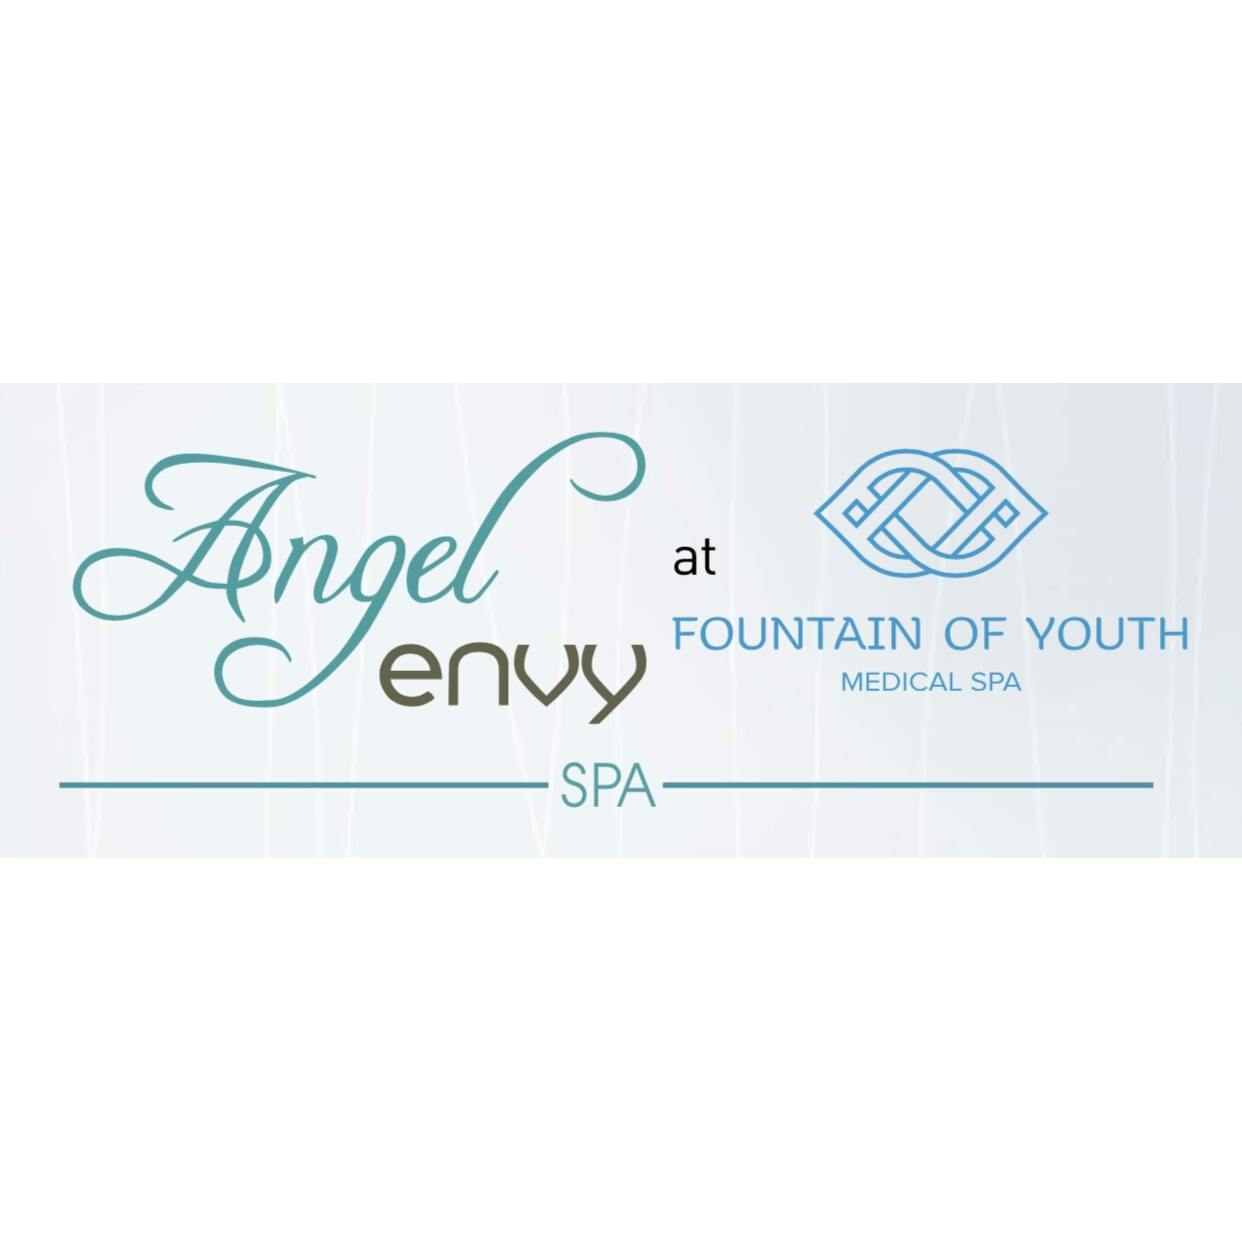 Angel Envy Spa-Inside Fountain Of Youth Med Spa - Sanford, FL - Dermatologists